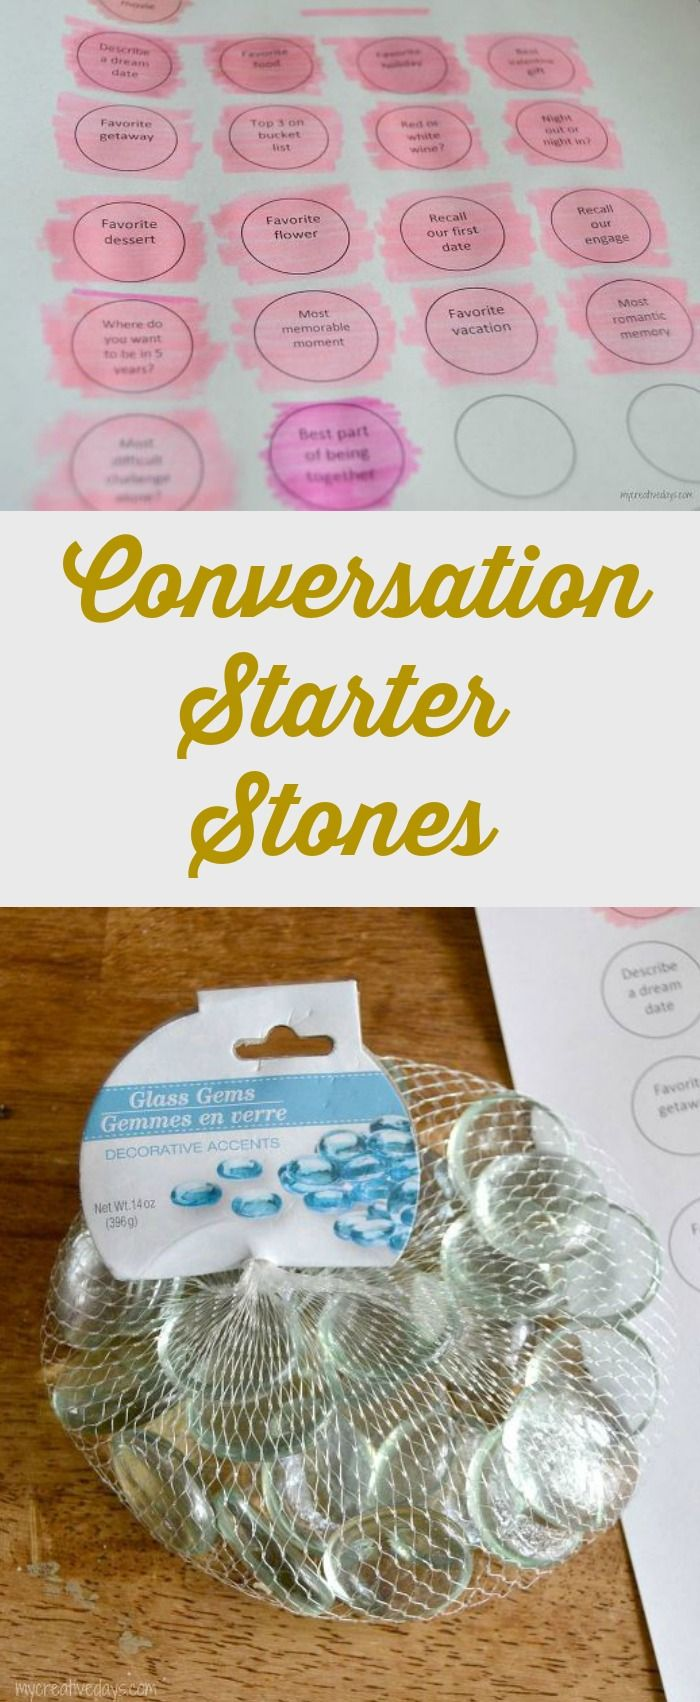 Ice breaker conversation starters dating